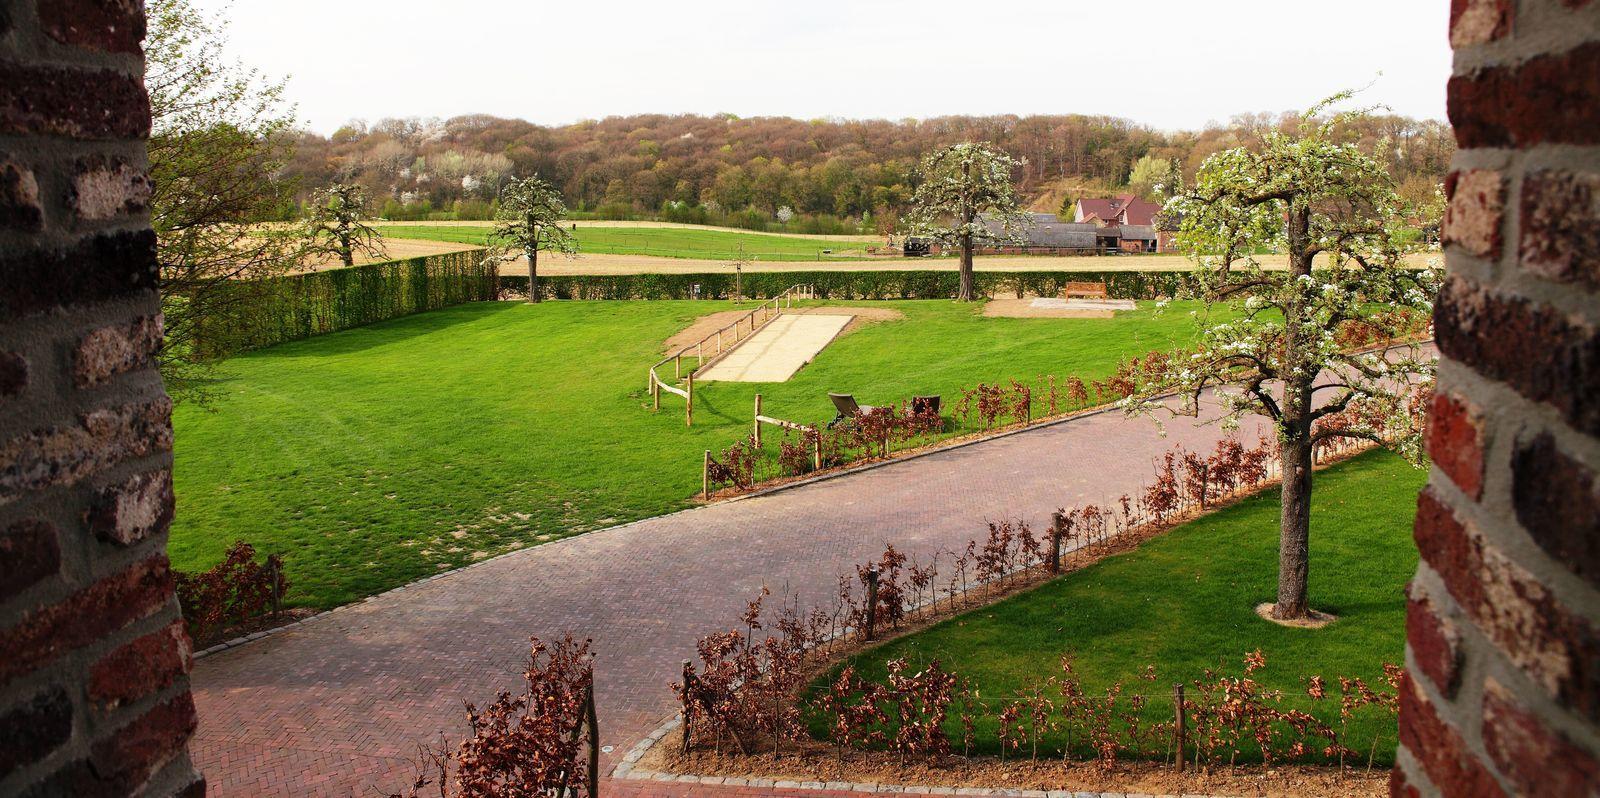 Landgoed St. Geertruid Loft Brederode - luxe vakantiehuis Zuid-Limburg